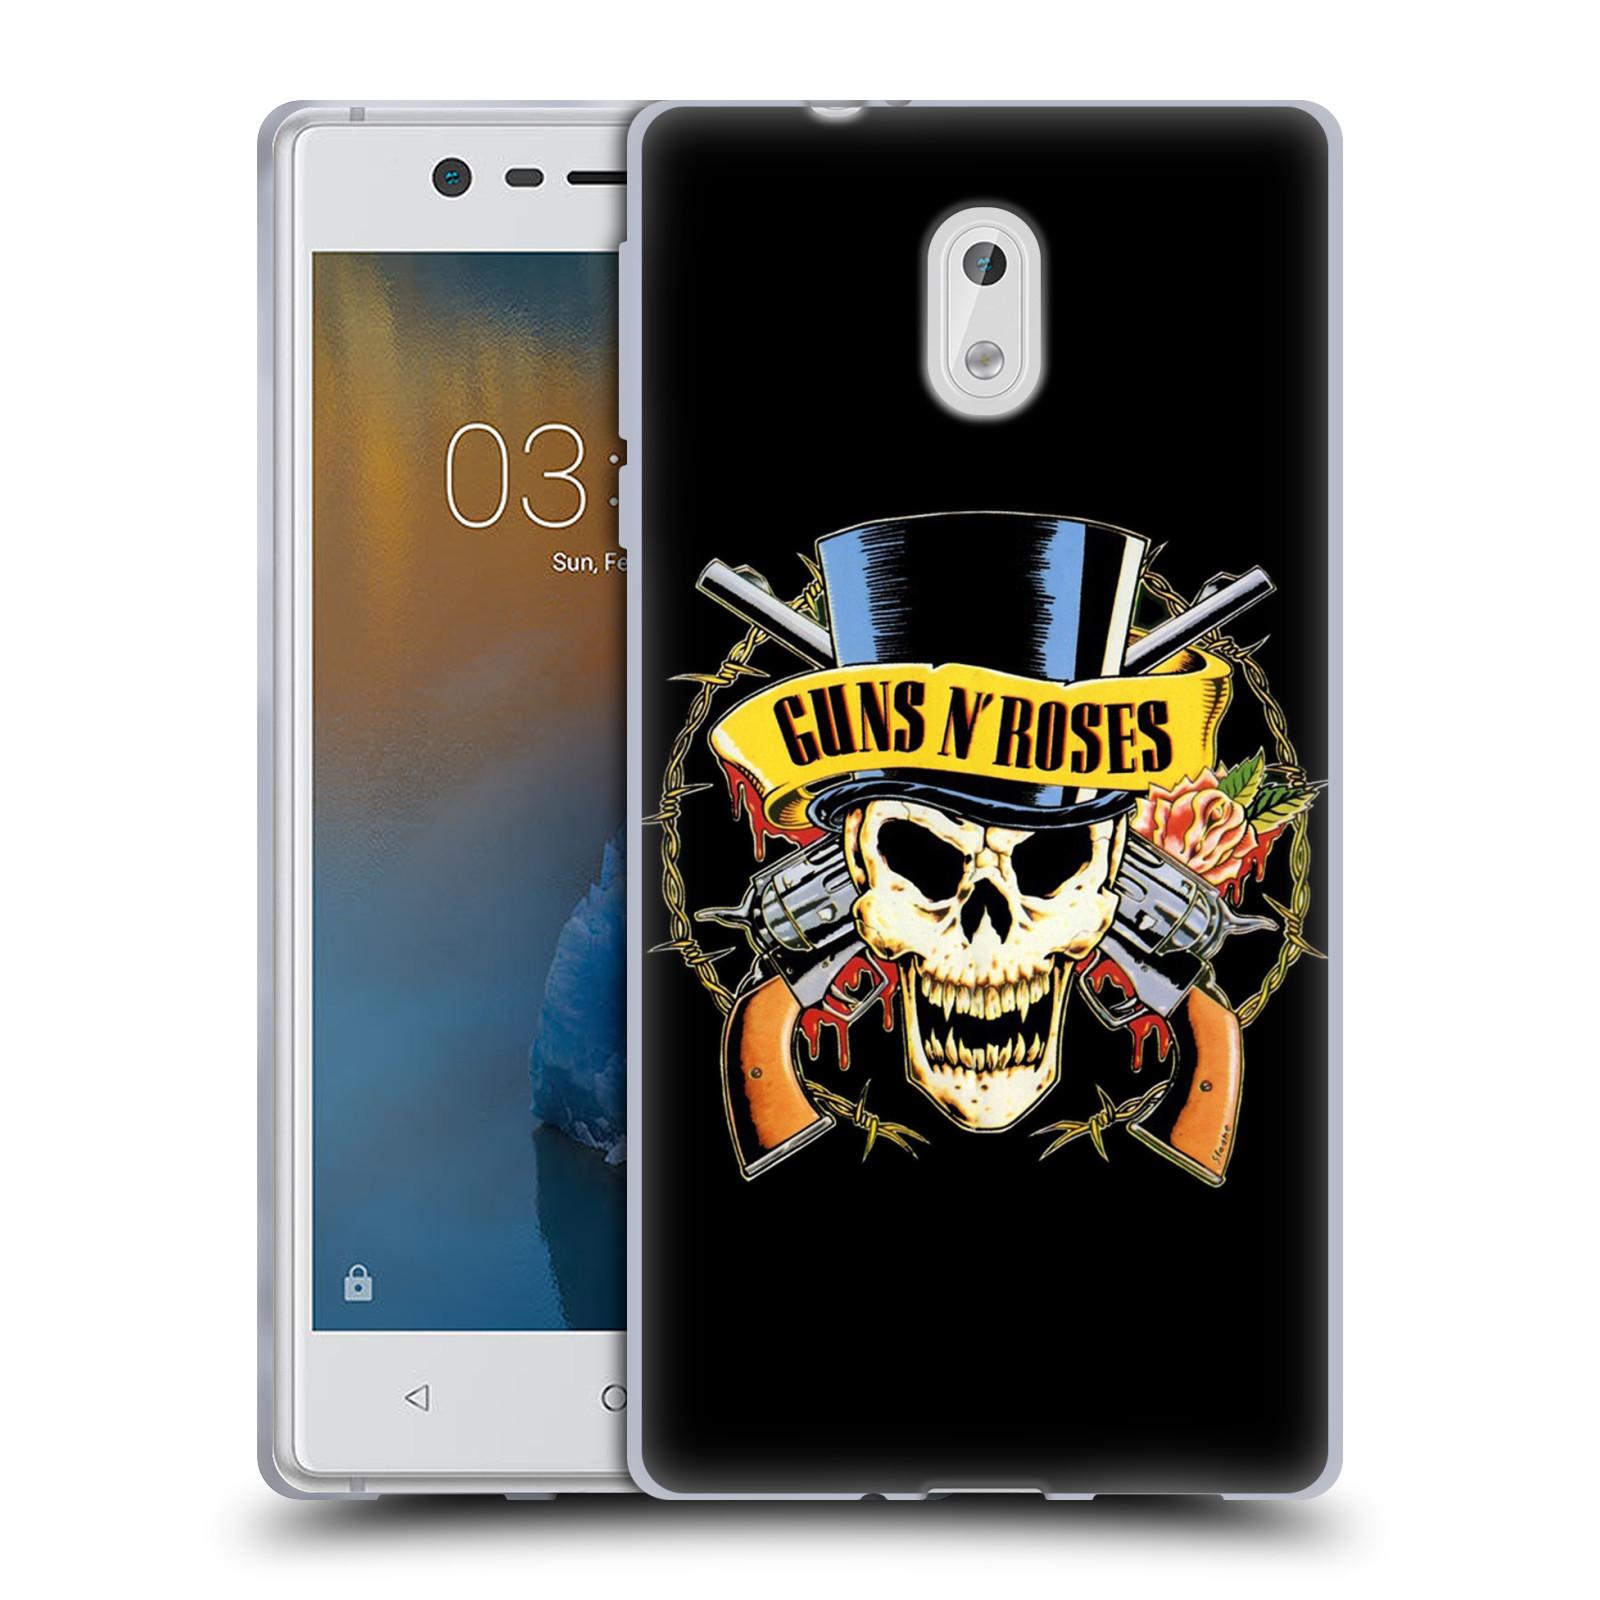 Silikonové pouzdro na mobil Nokia 3 Head Case - Guns N' Roses - Lebka